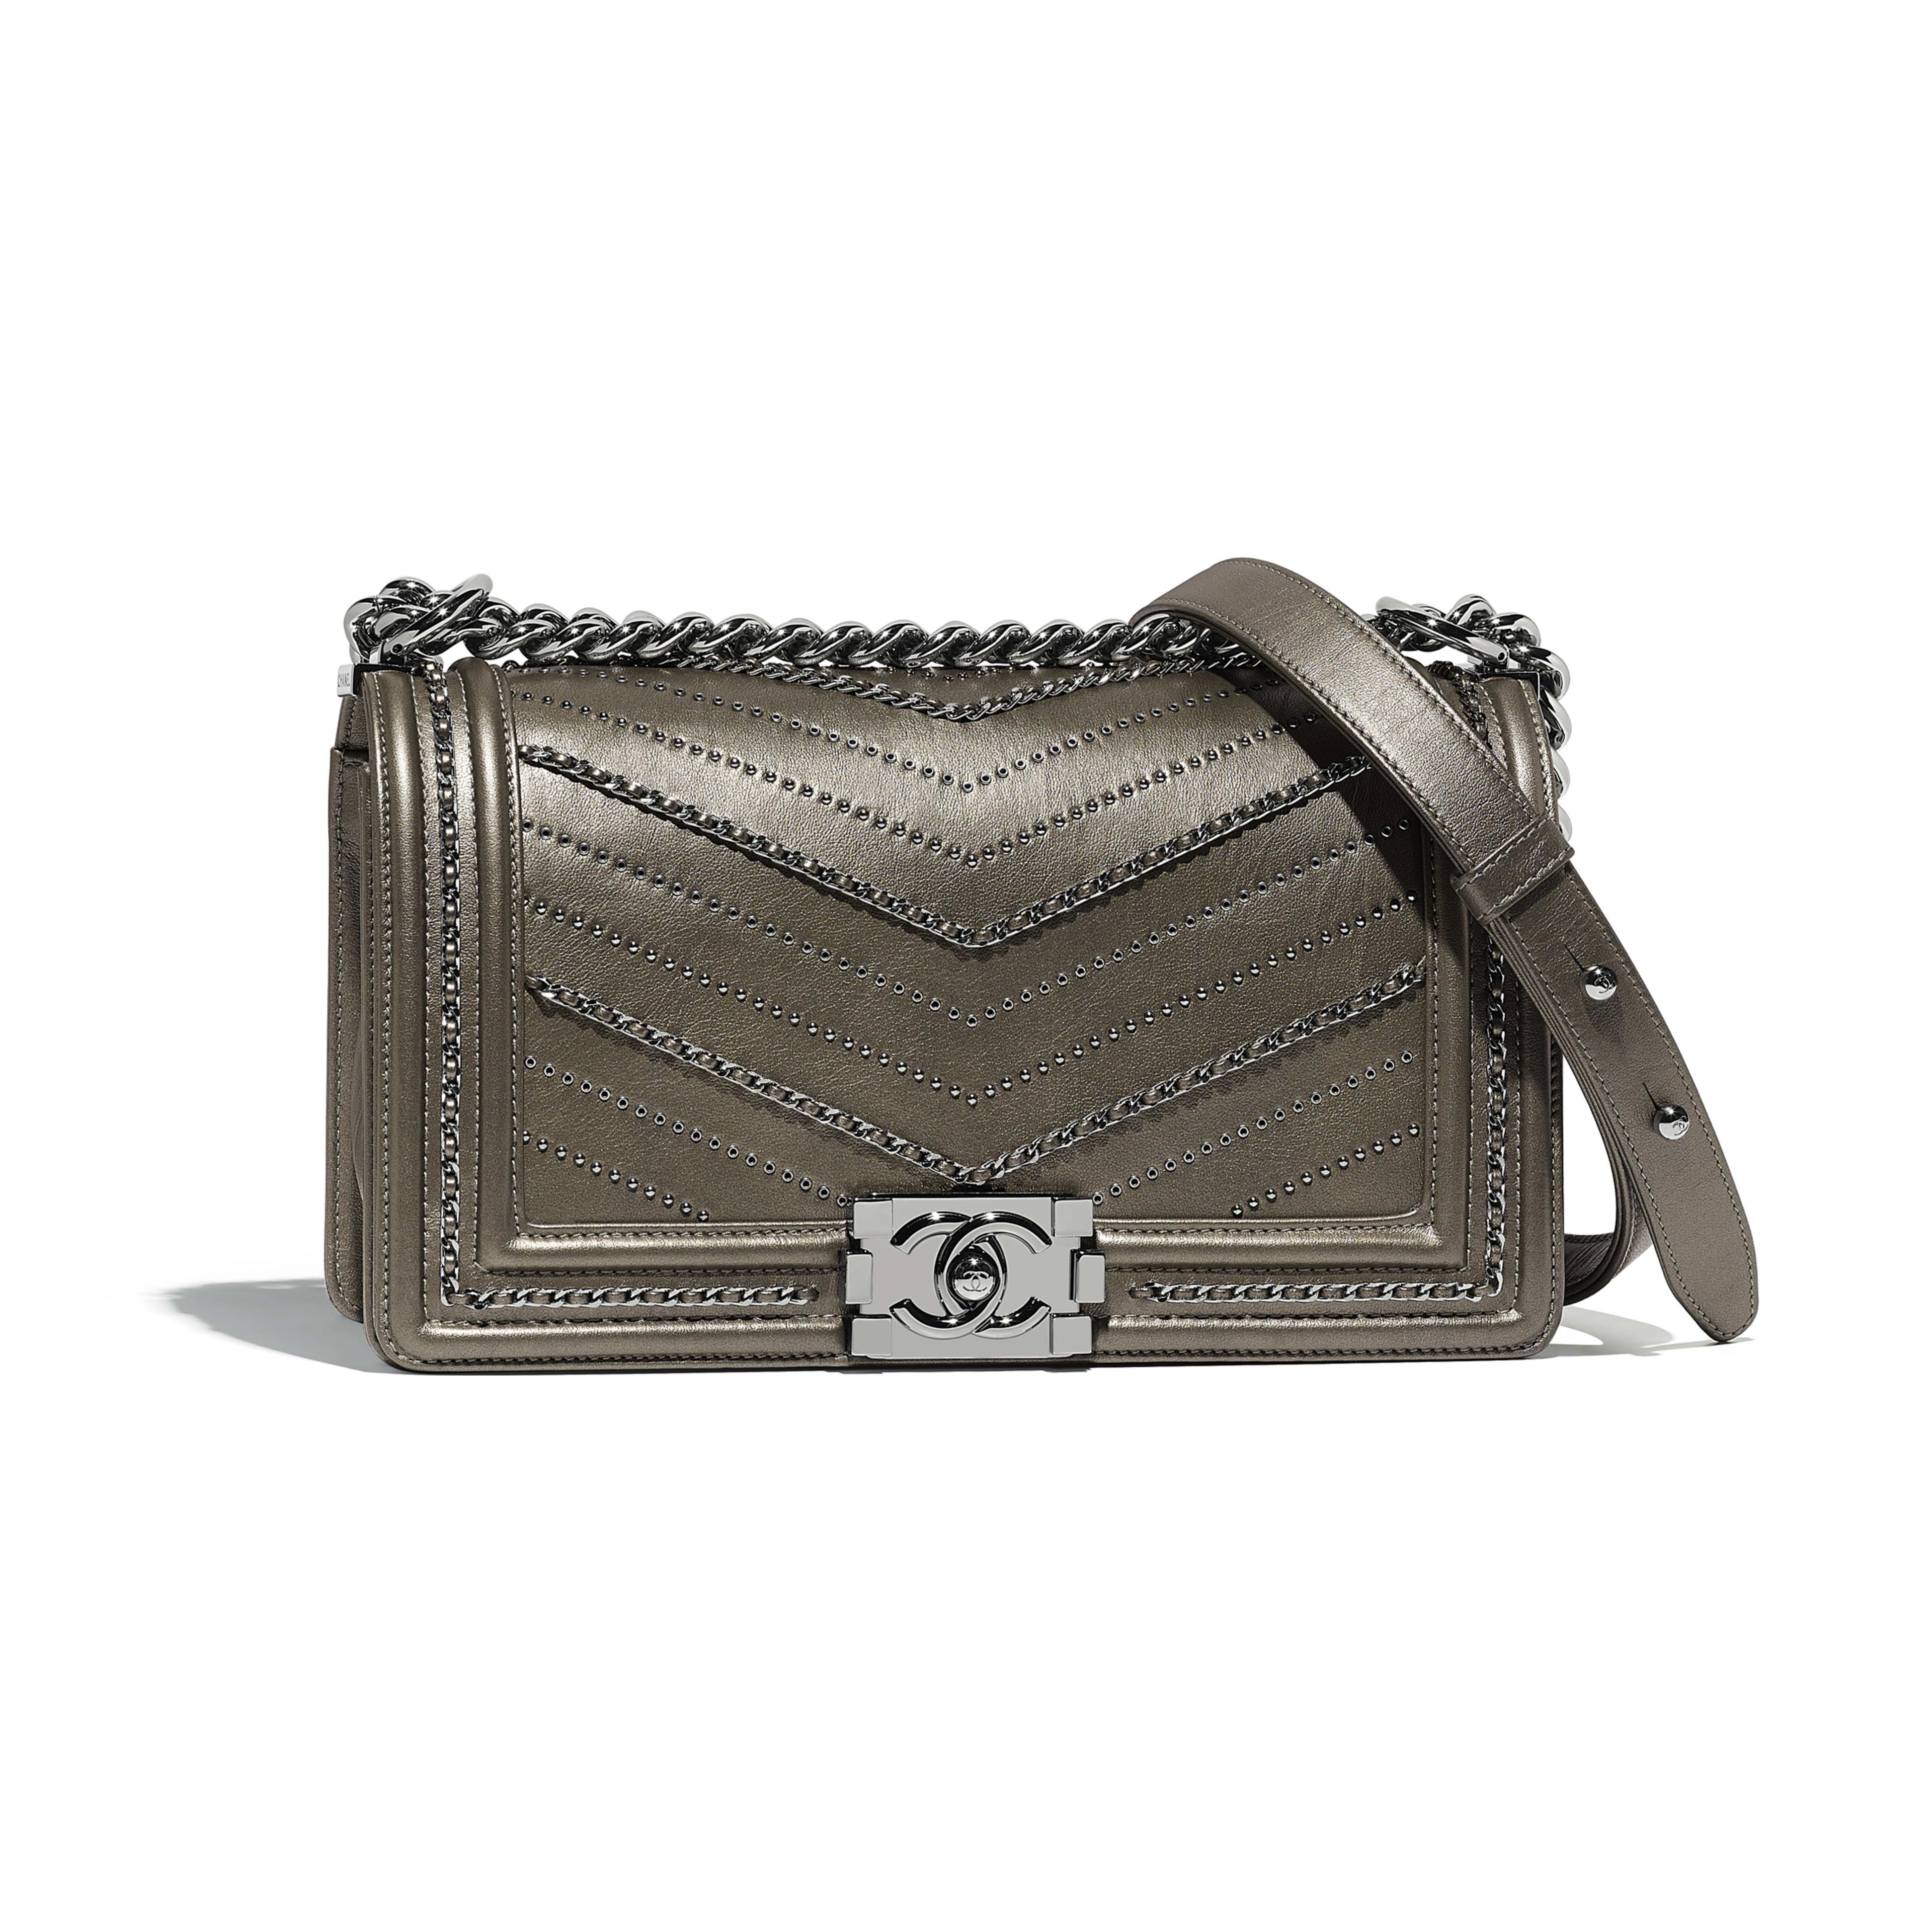 BOY CHANEL Handbag - Silver - Metallic Crumpled Calfskin & Ruthenium-Finish Metal - Default view - see full sized version